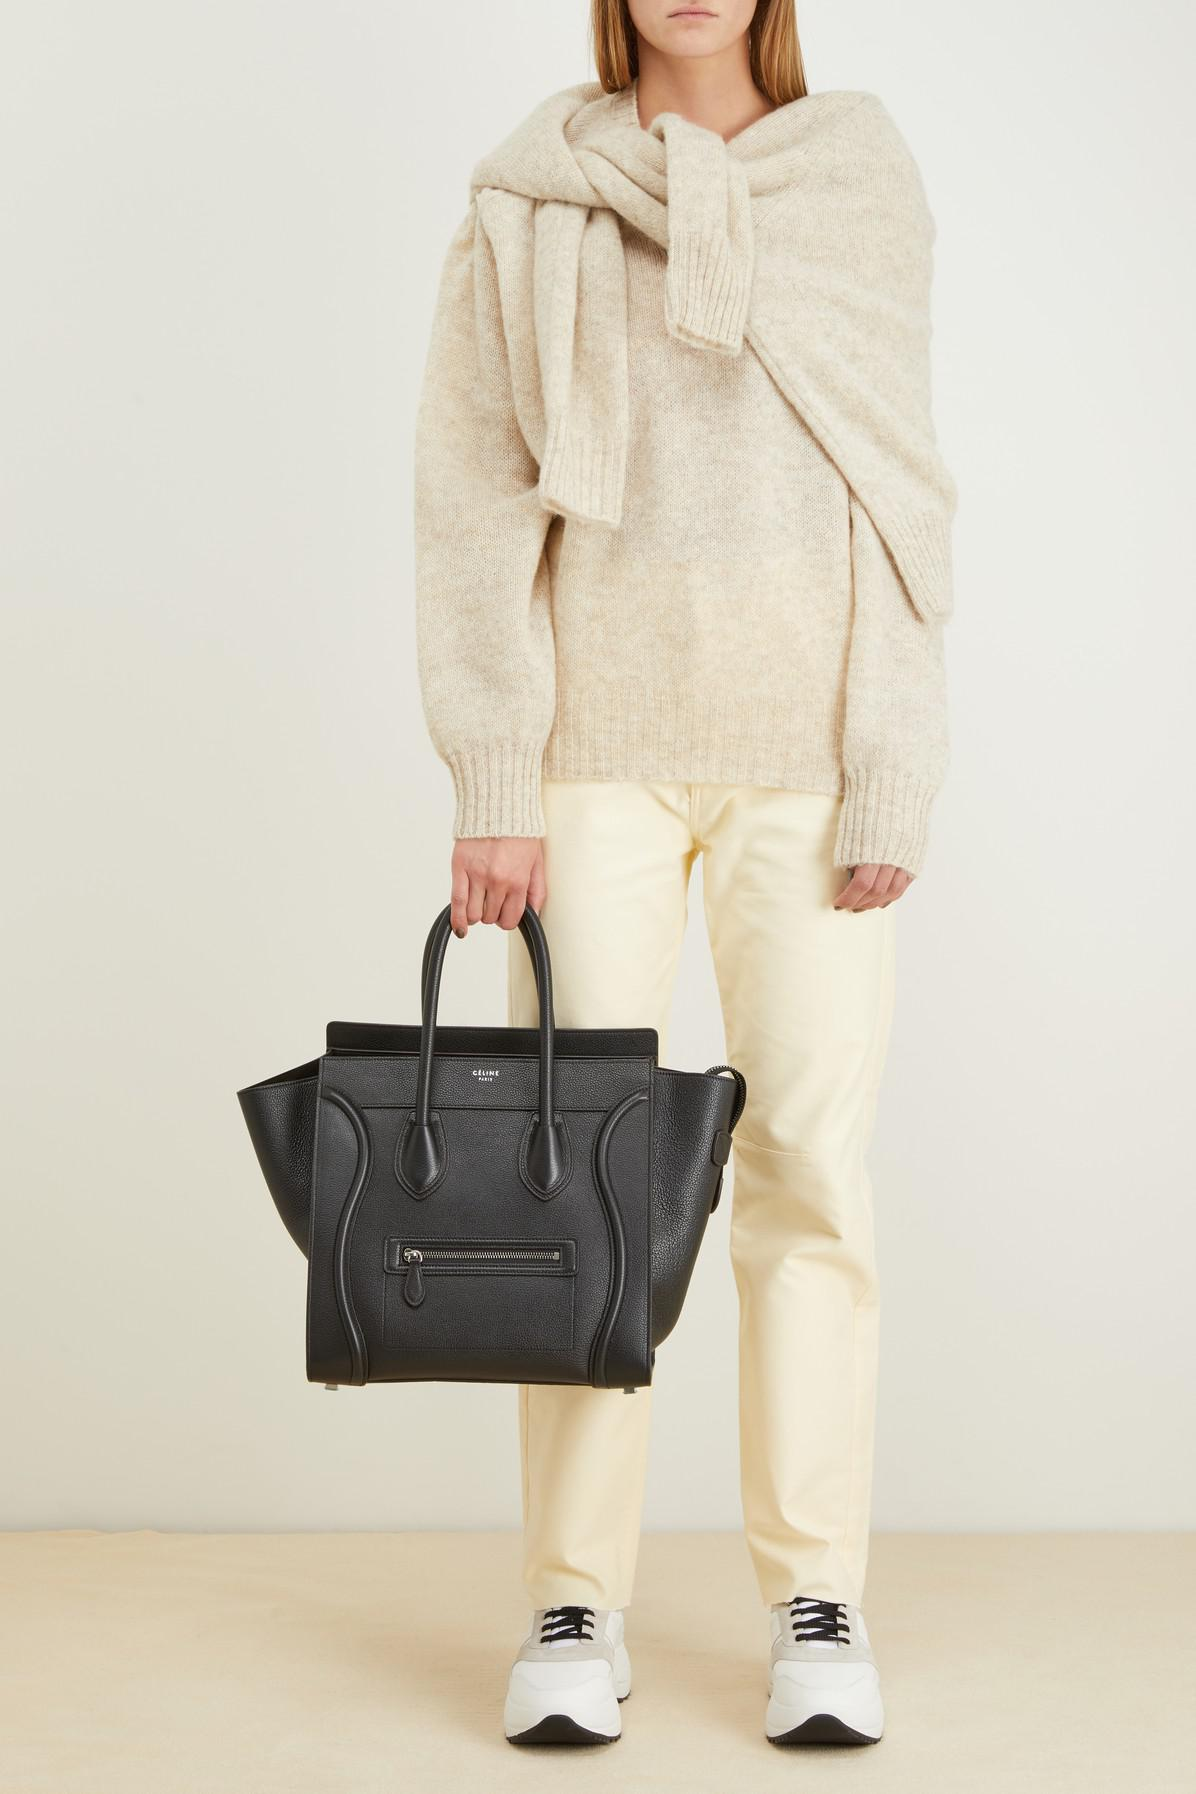 bc6925a03b0e Lyst - Céline Mini Luggage Handbag In Drummed Calfskin in Black